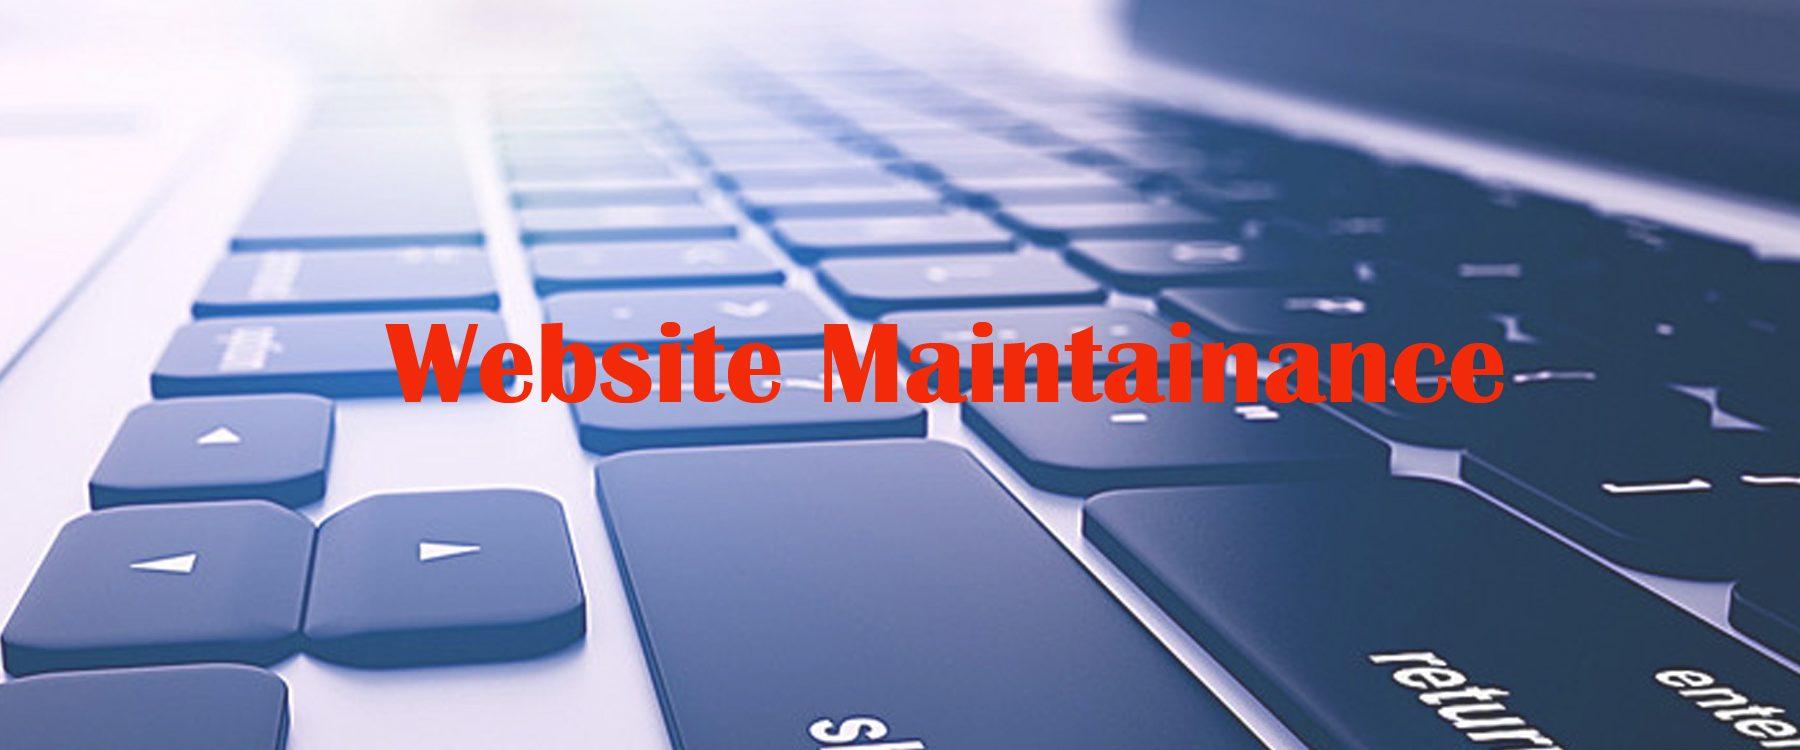 1technologies website maintainance Website Maintainance website maintainance 1800x750